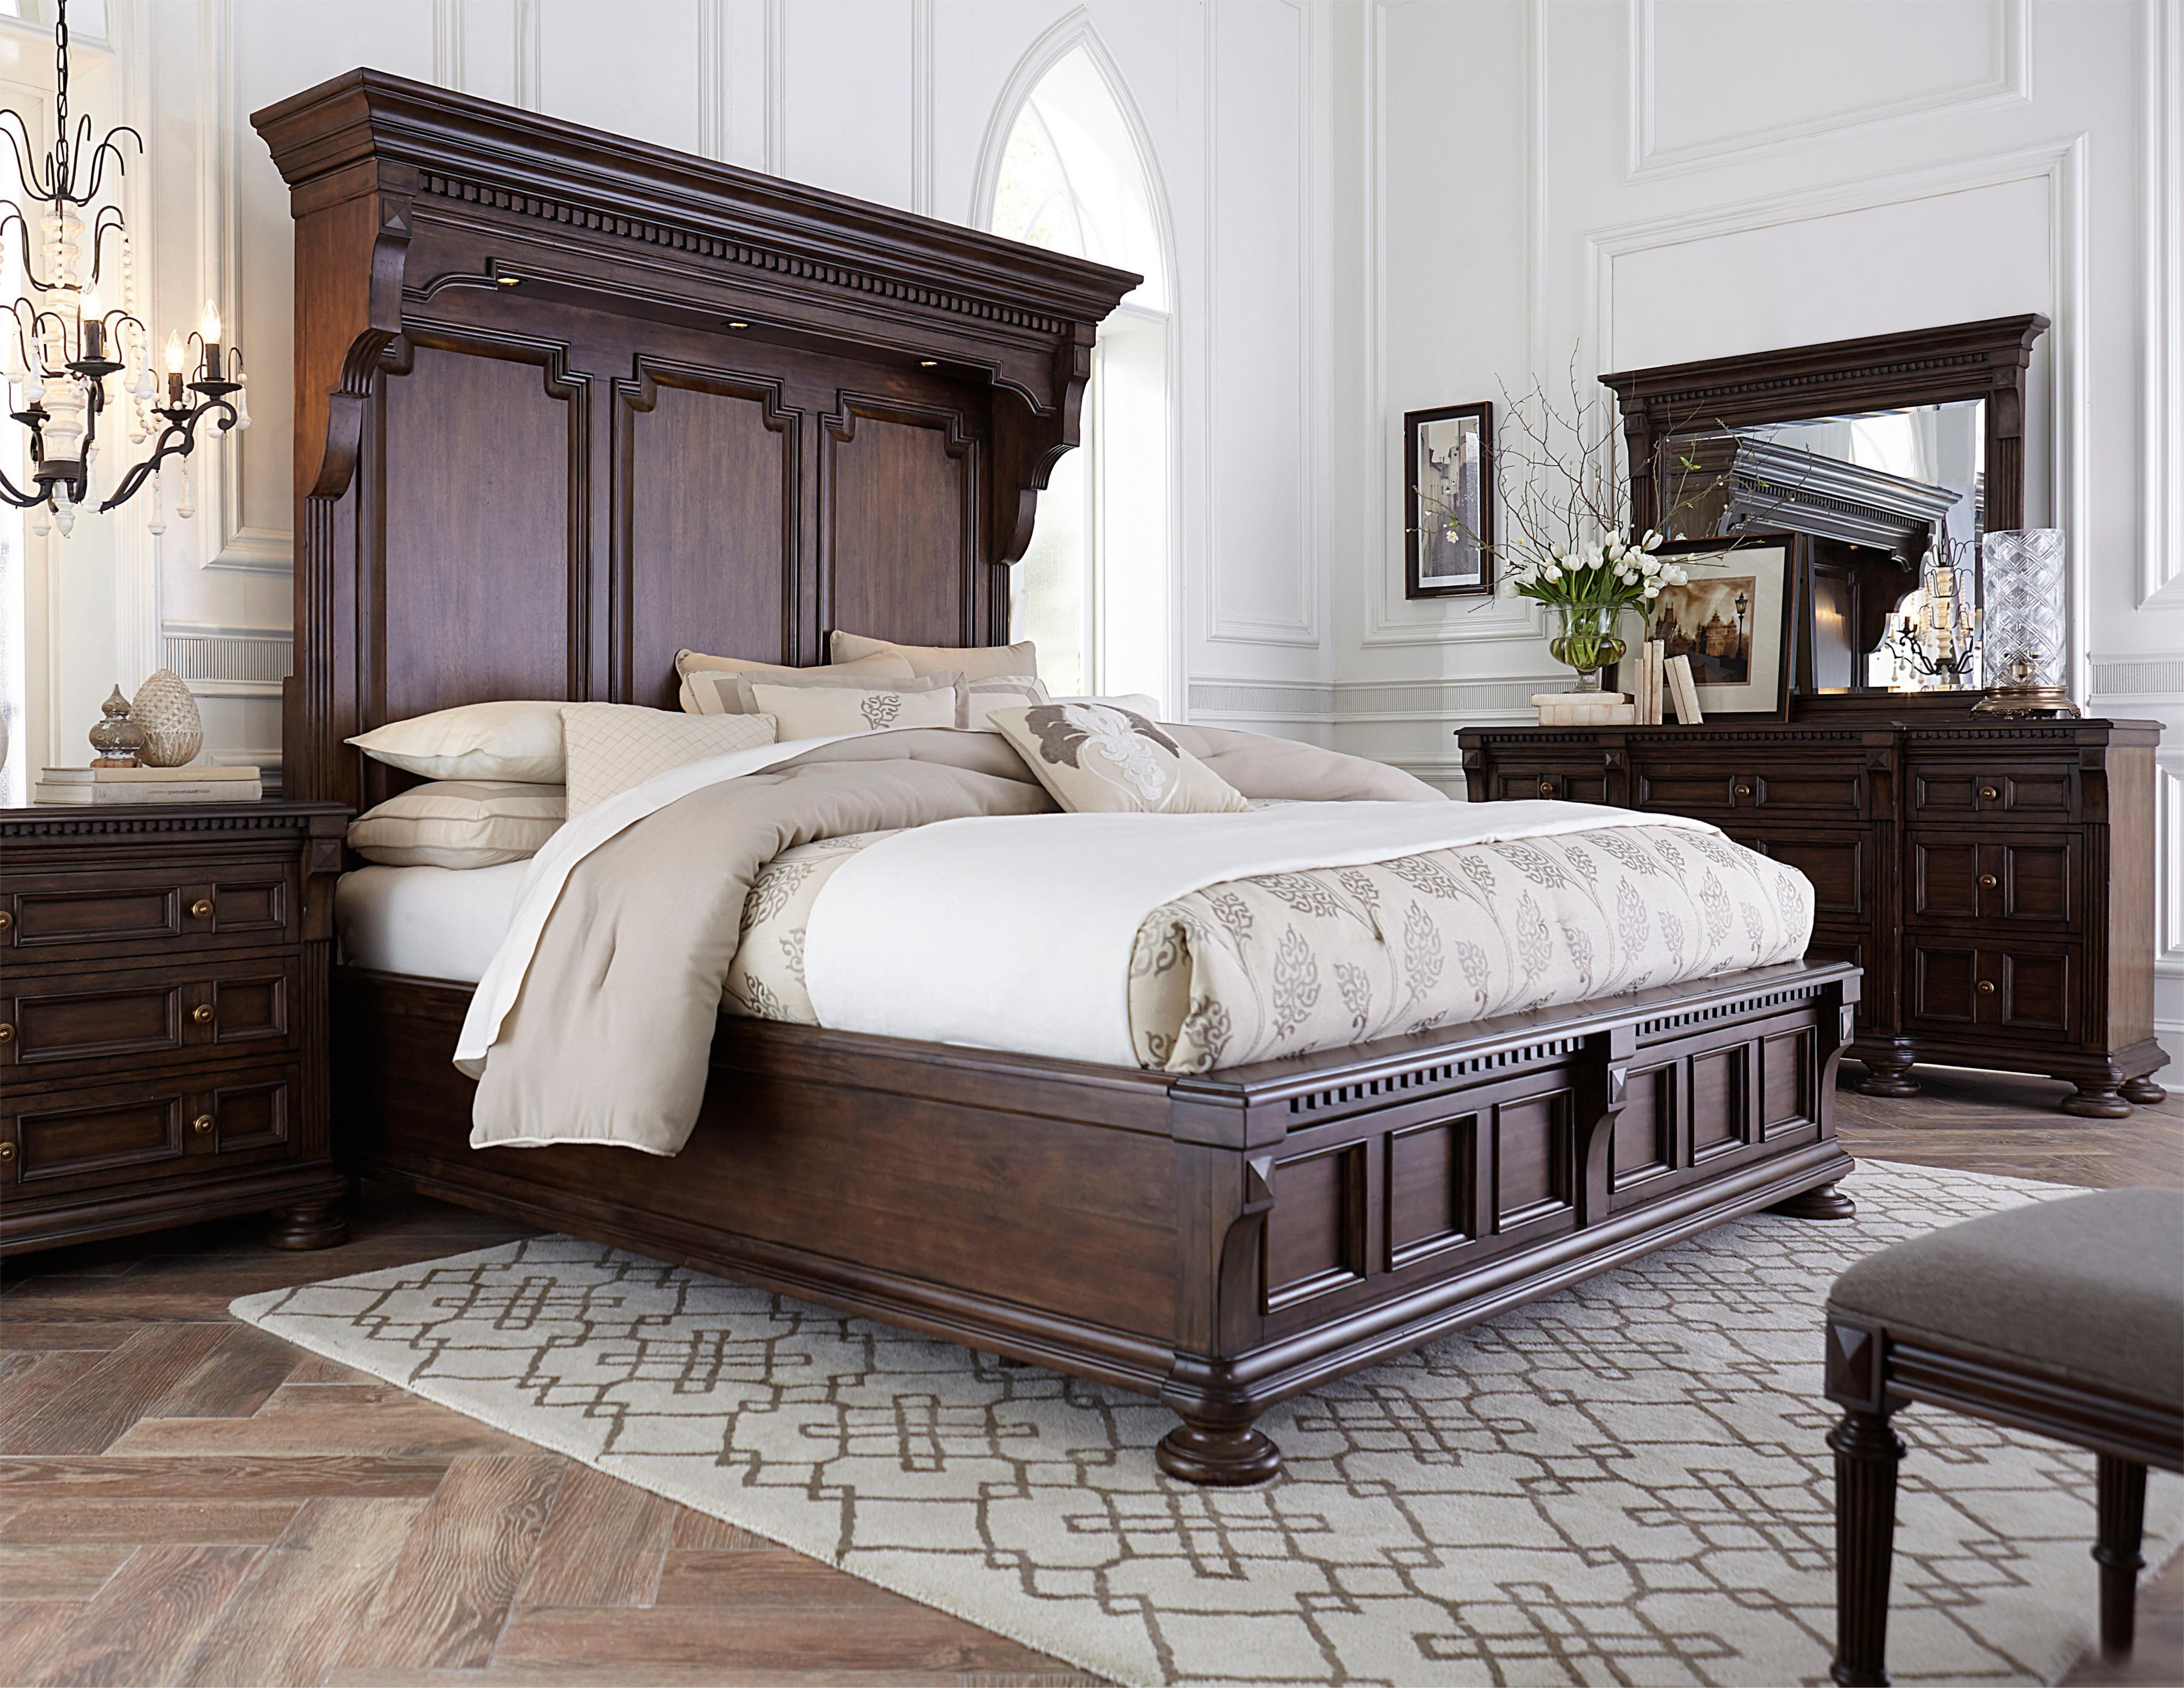 12 Elegant Tricks Of How To Make Discontinued Broyhill Bedroom Furniture Bedroom Furniture Sets Broyhill Furniture Broyhill Bedroom Furniture